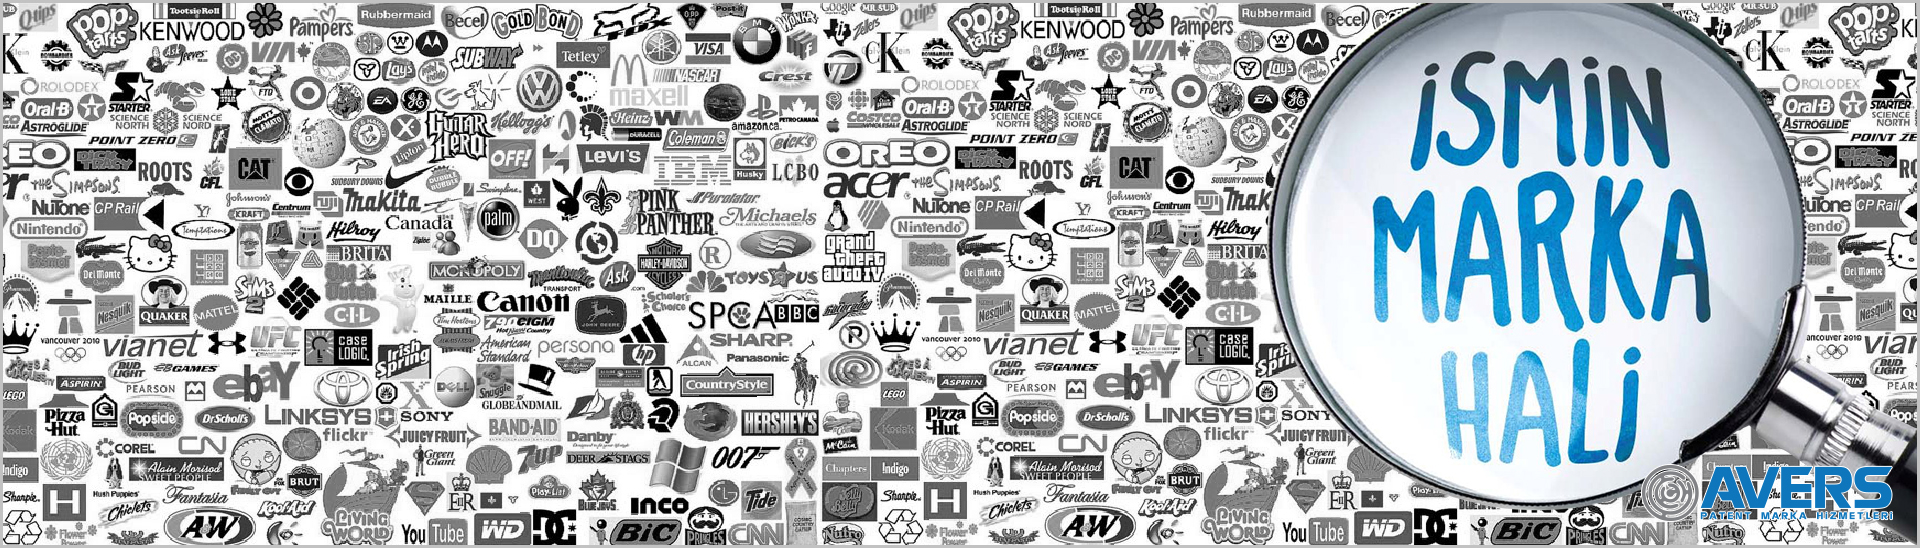 Ticari marka nedir